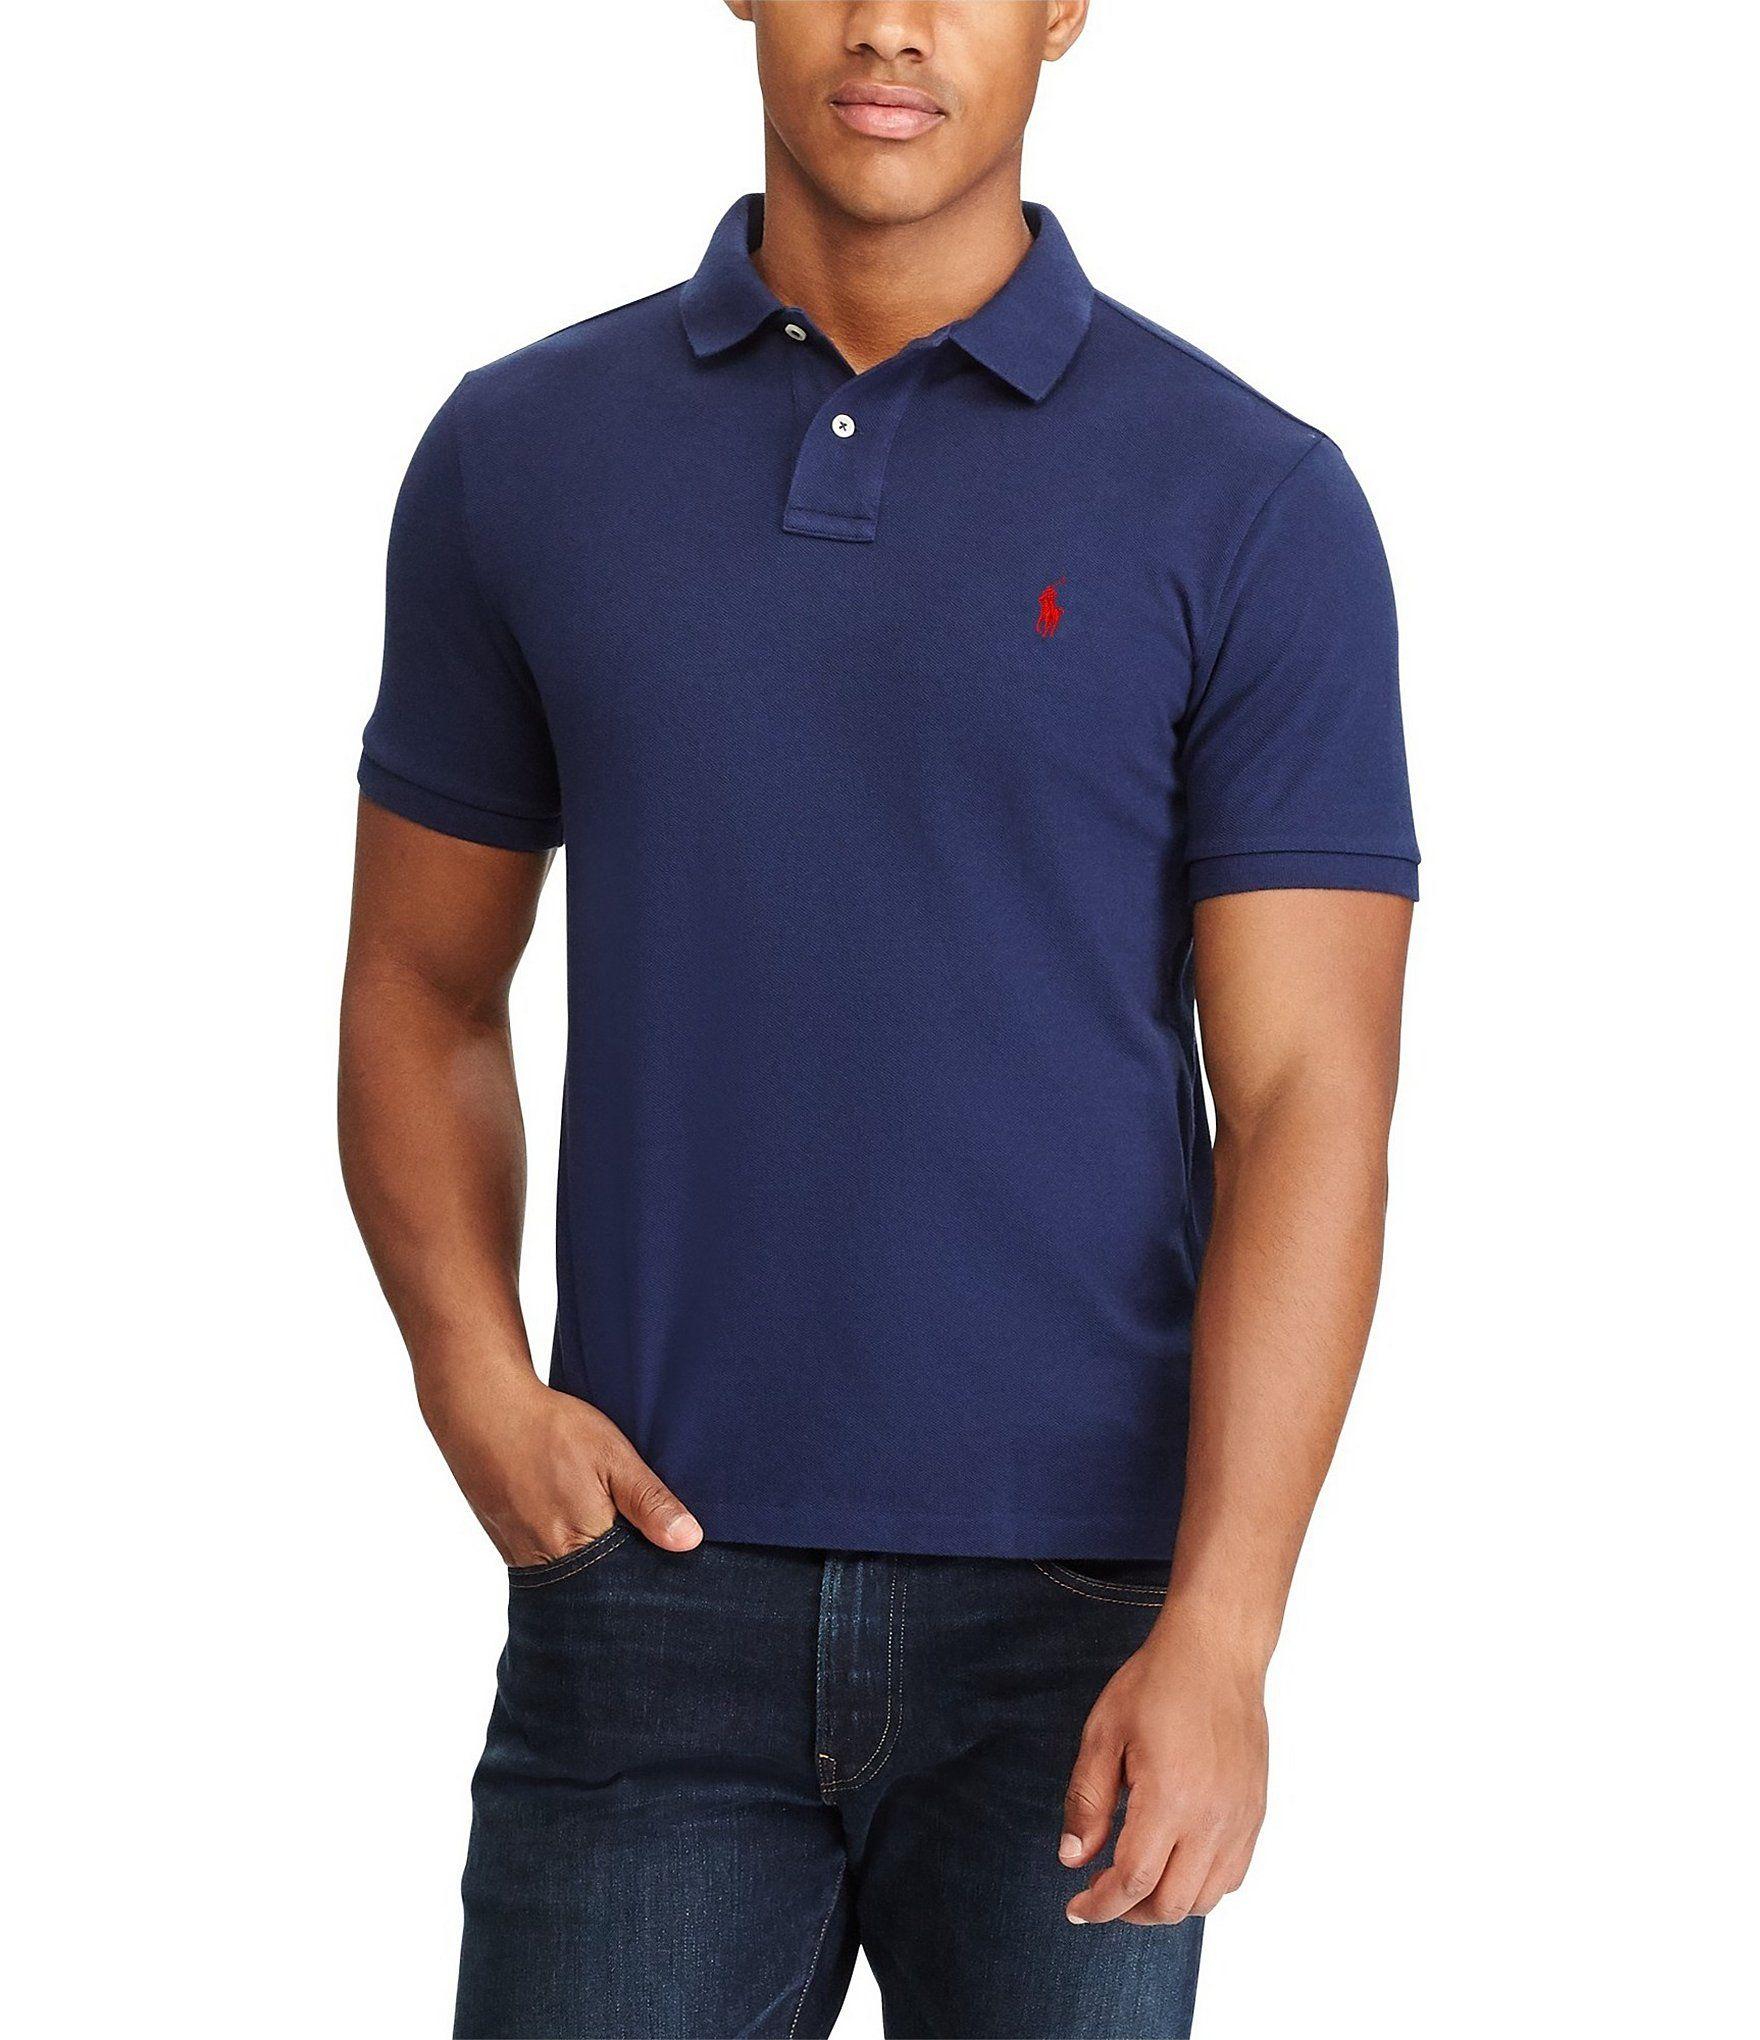 Polo Ralph Lauren Big Tall Classic Fit Short Sleeved Cotton Mesh Polo Shirt Newport Navy 4xt In 2020 Polo Ralph Lauren Polo Shirt Shirts